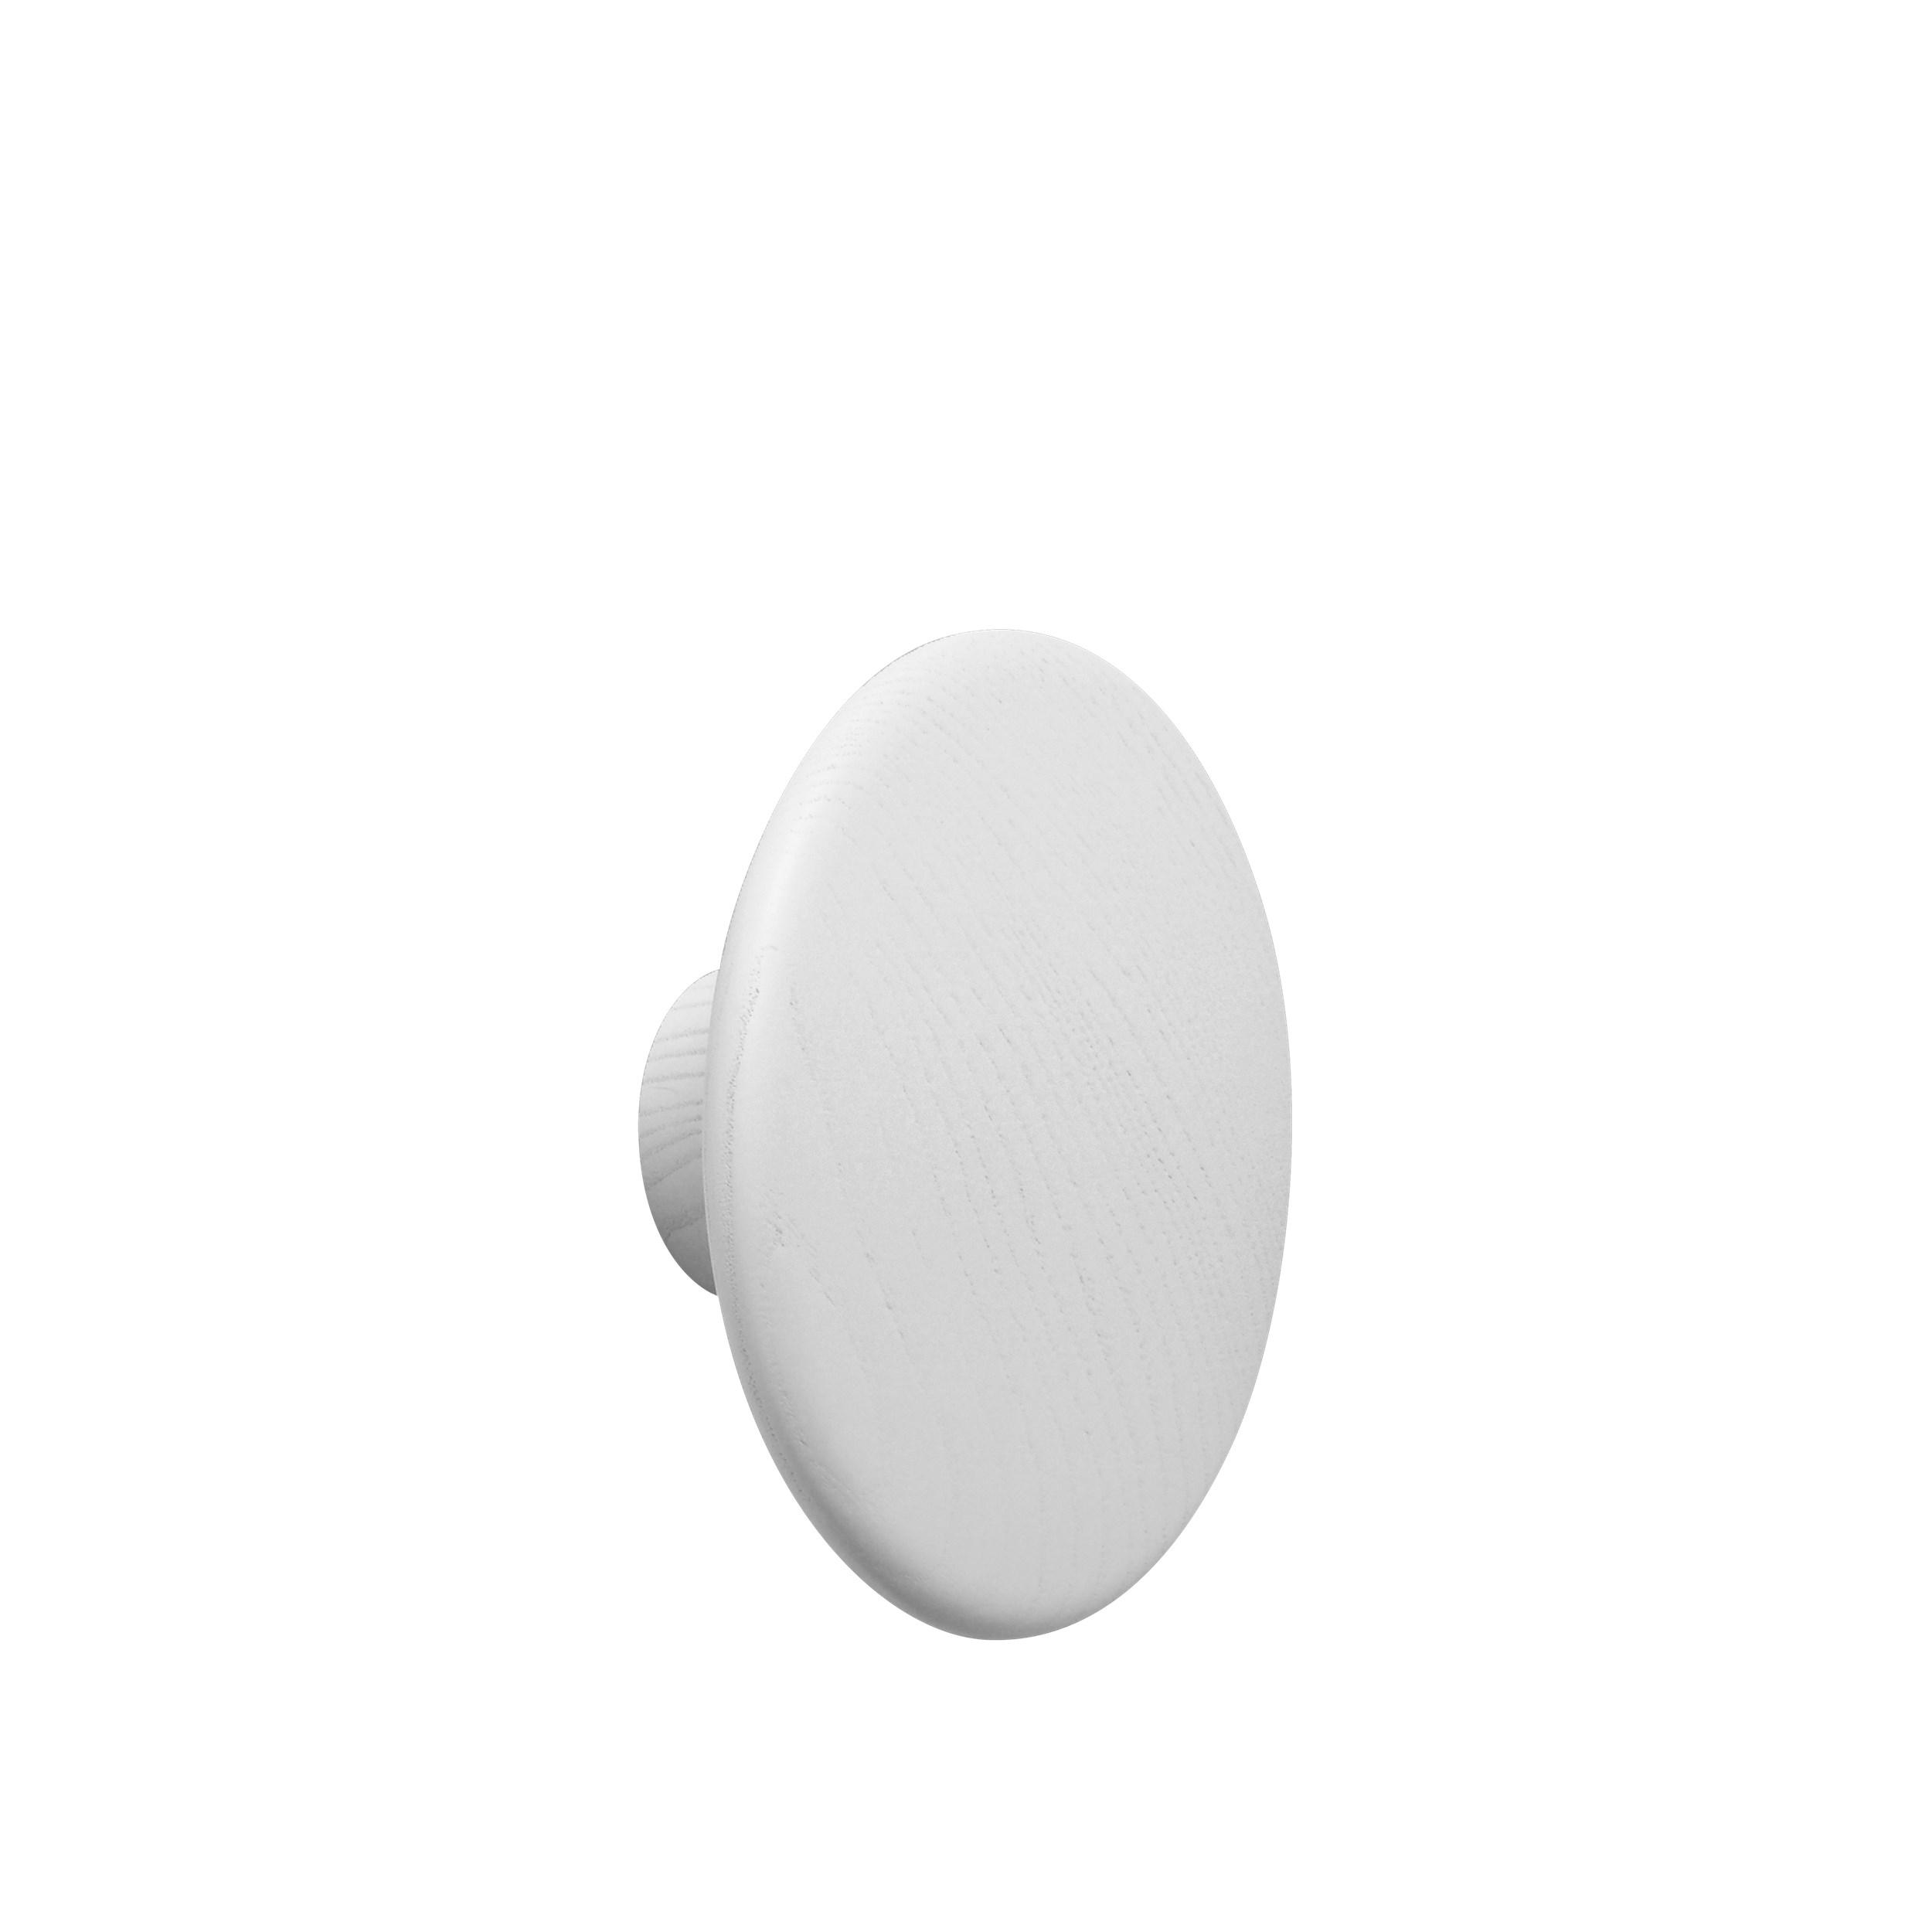 Dot wood large Ø 17 cm white